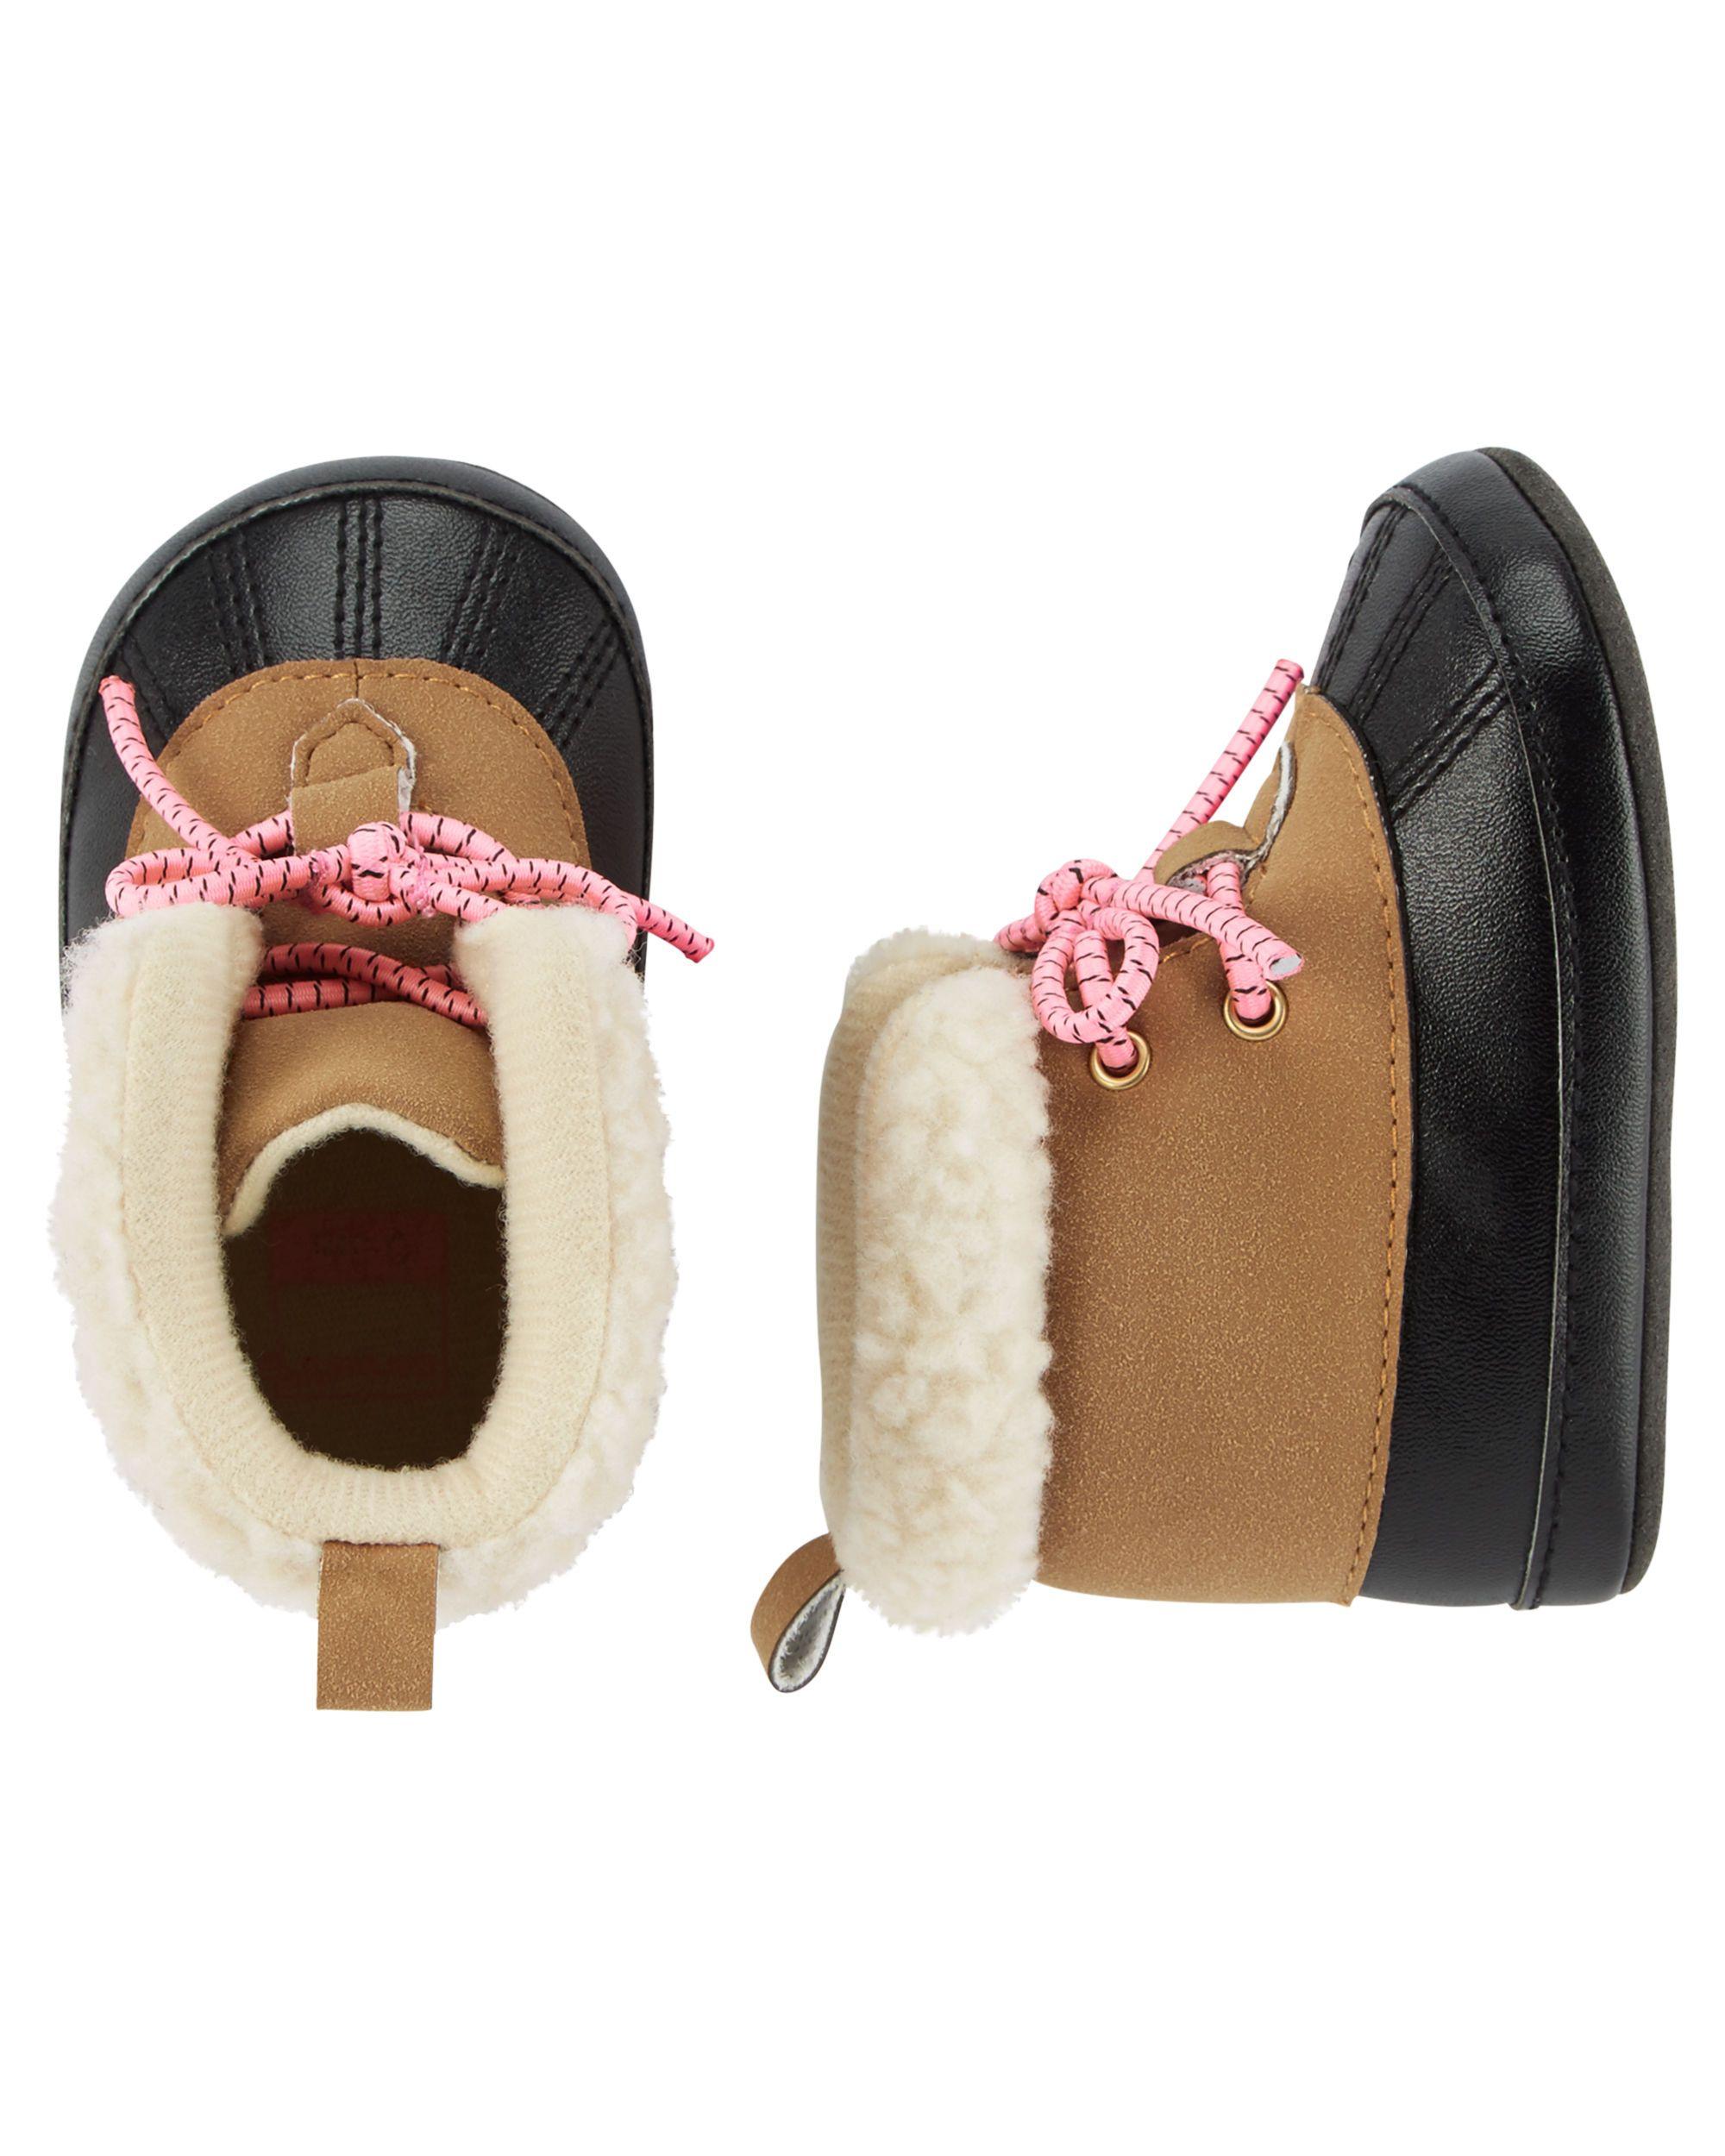 Carters Kids New Duck Boot